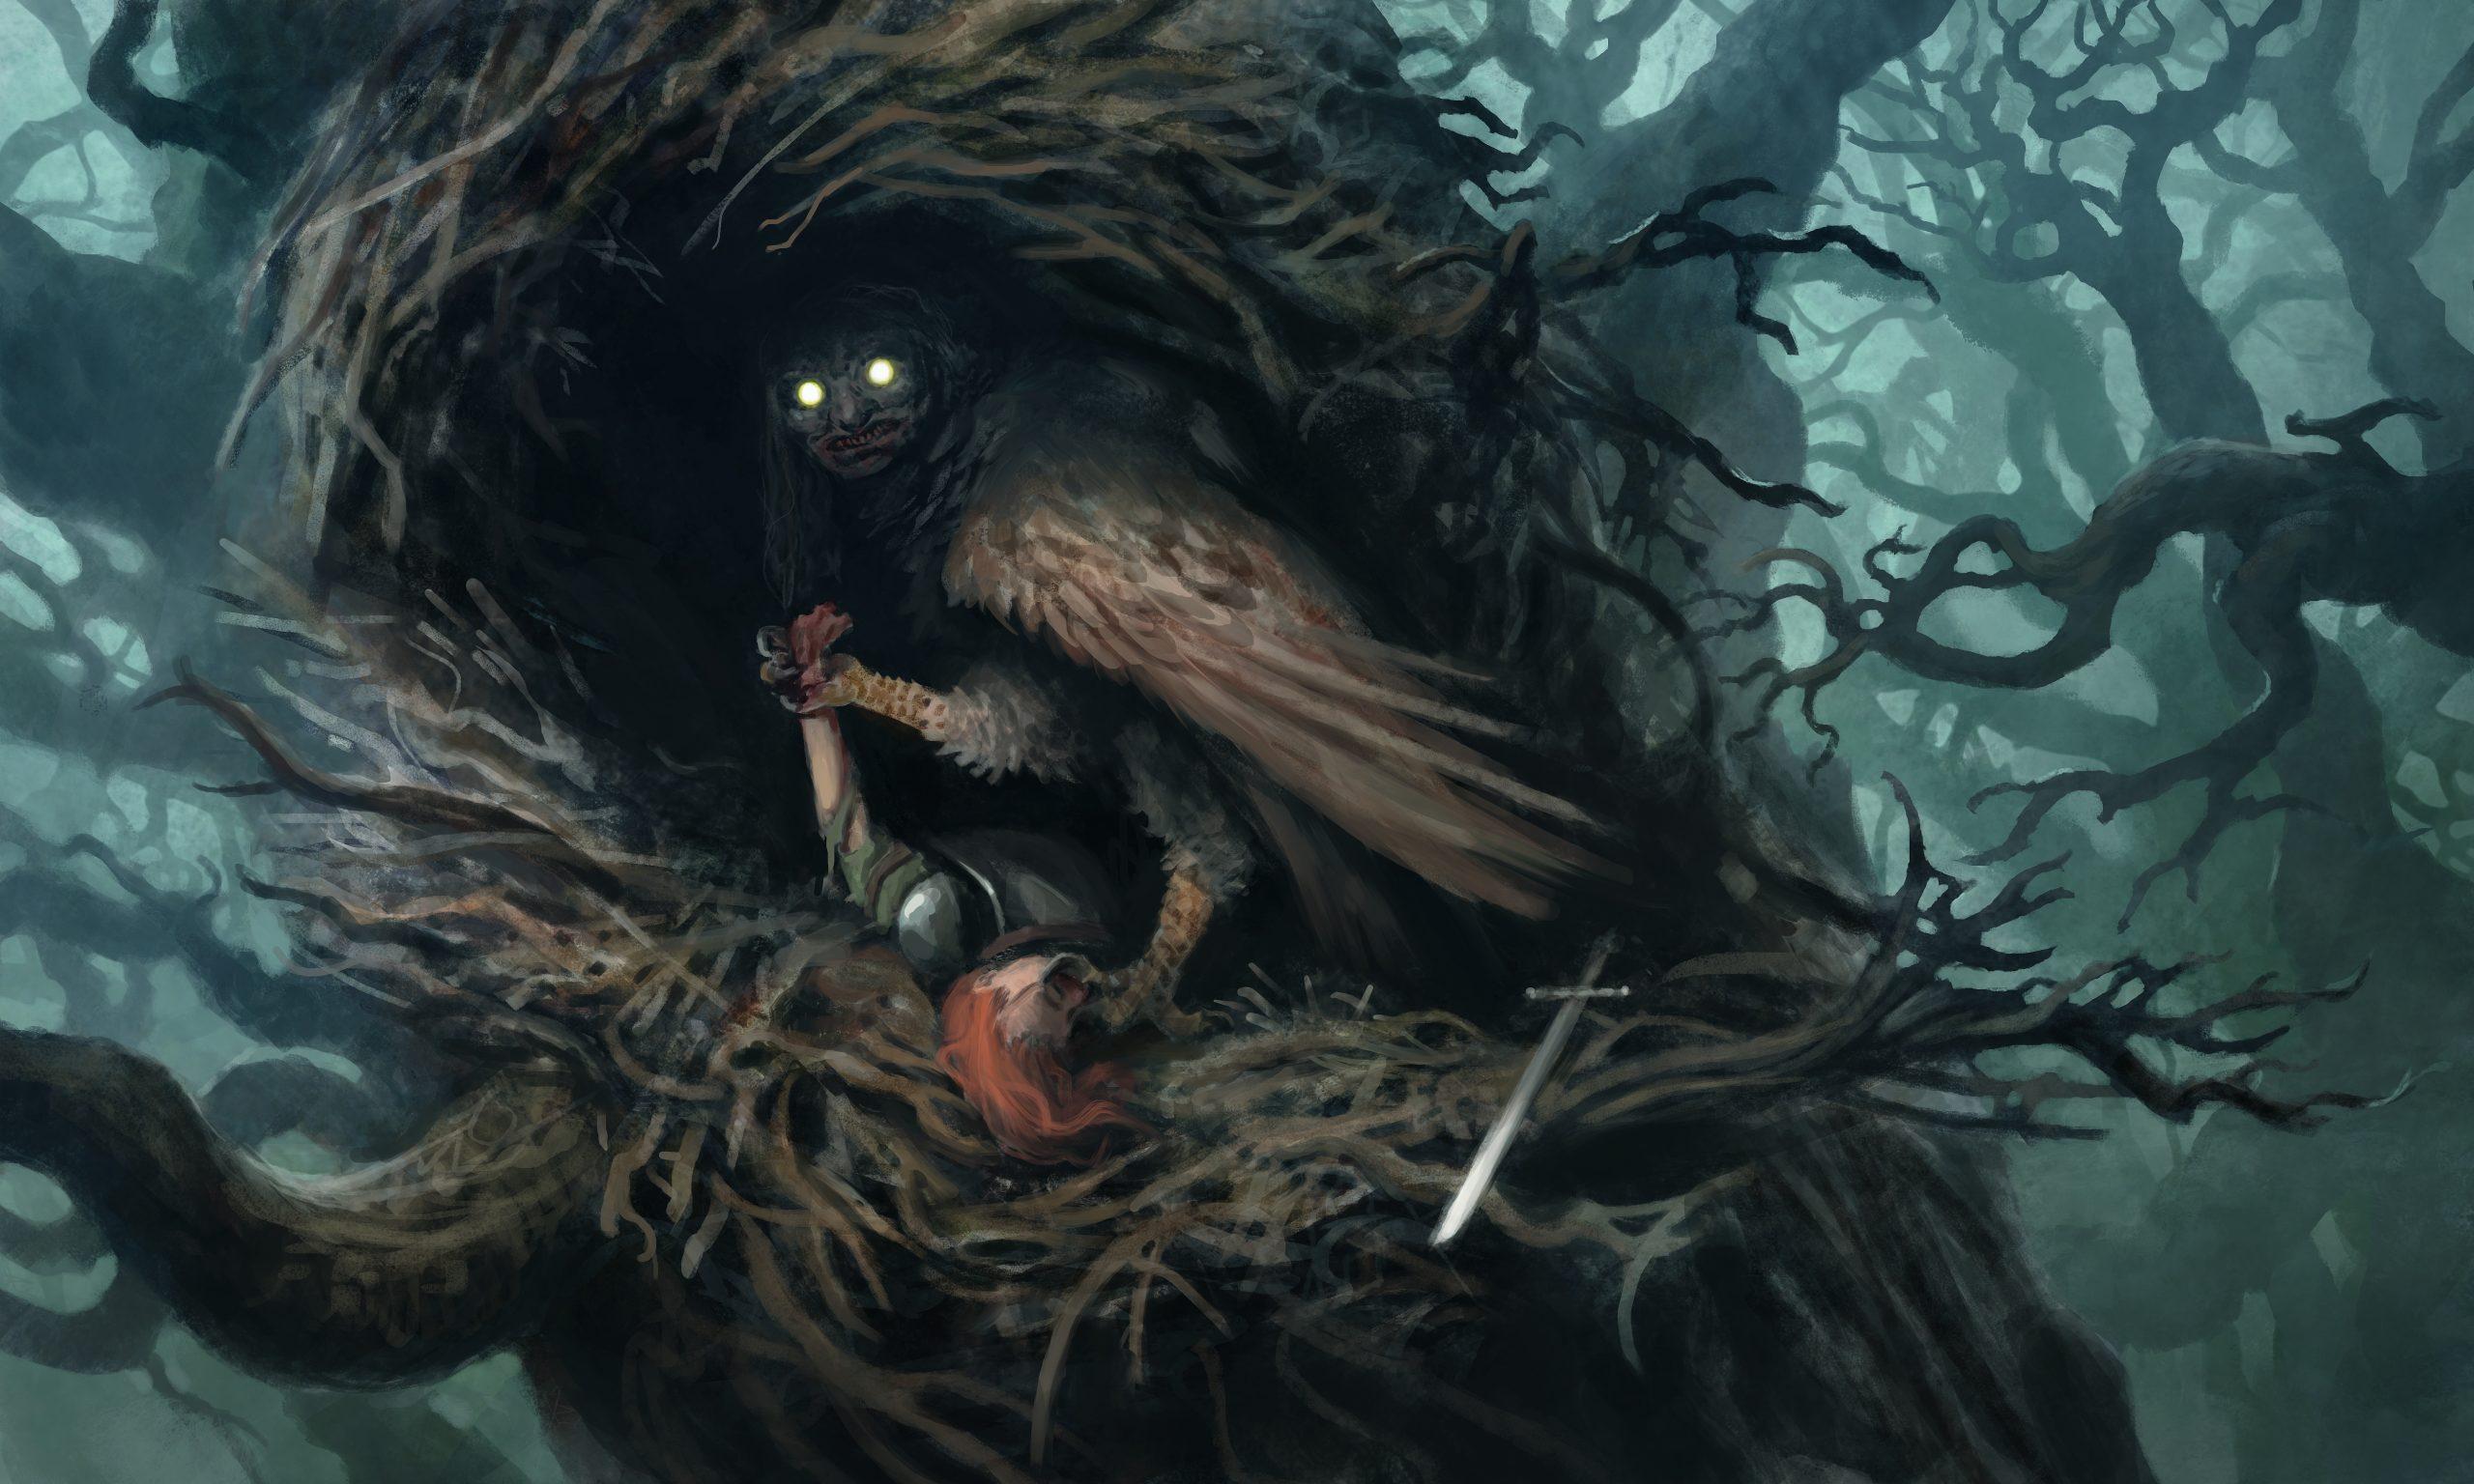 An Owl with a human face